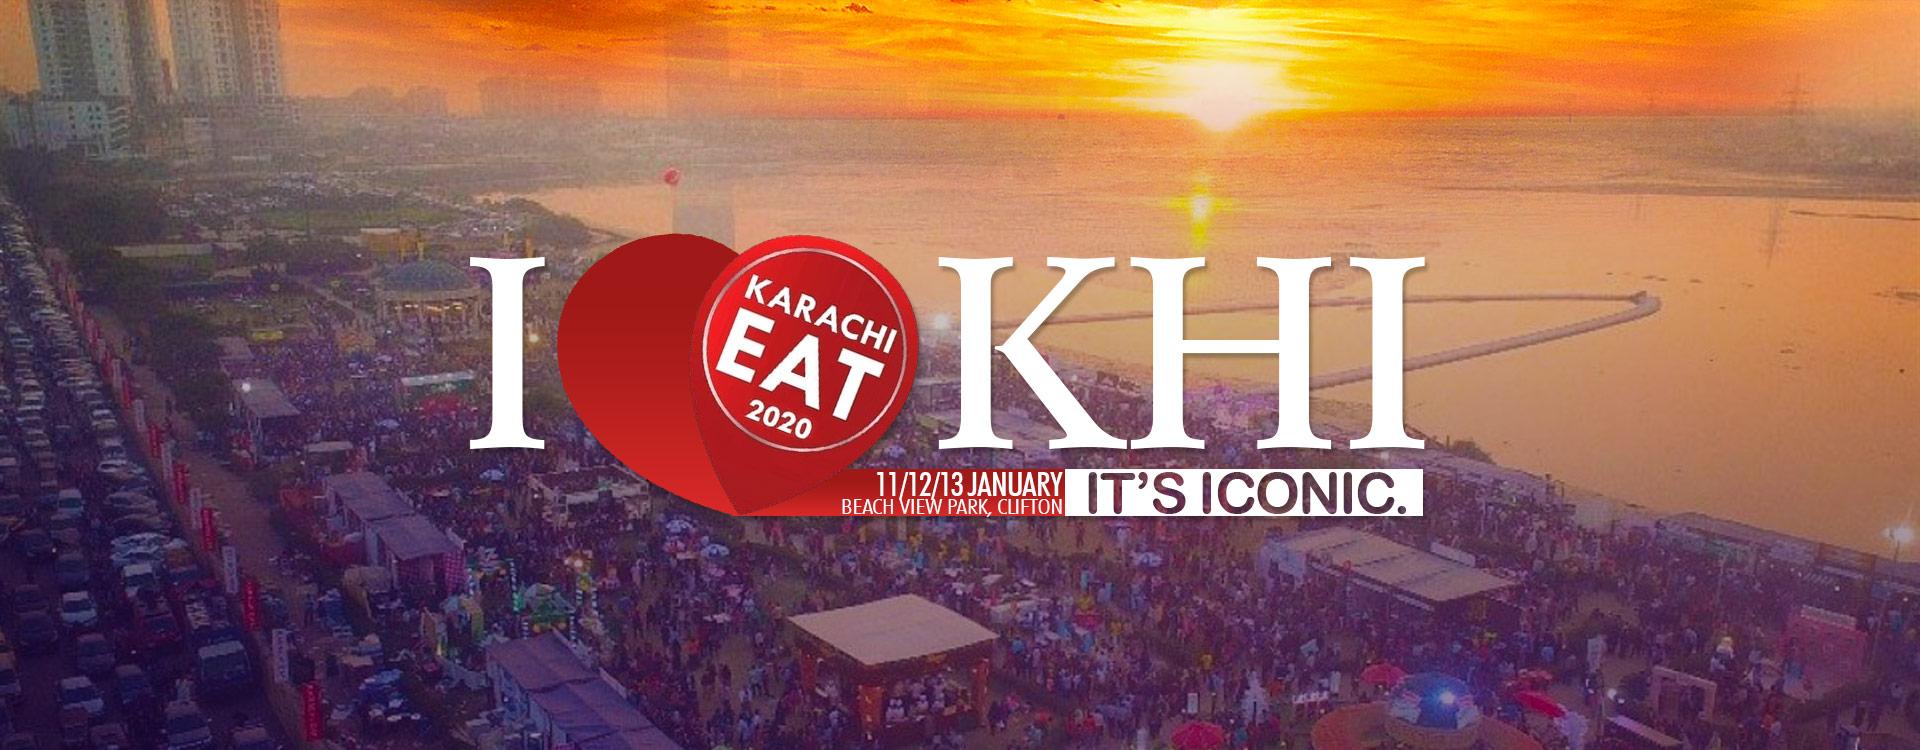 Karachi Eat Festival 2020